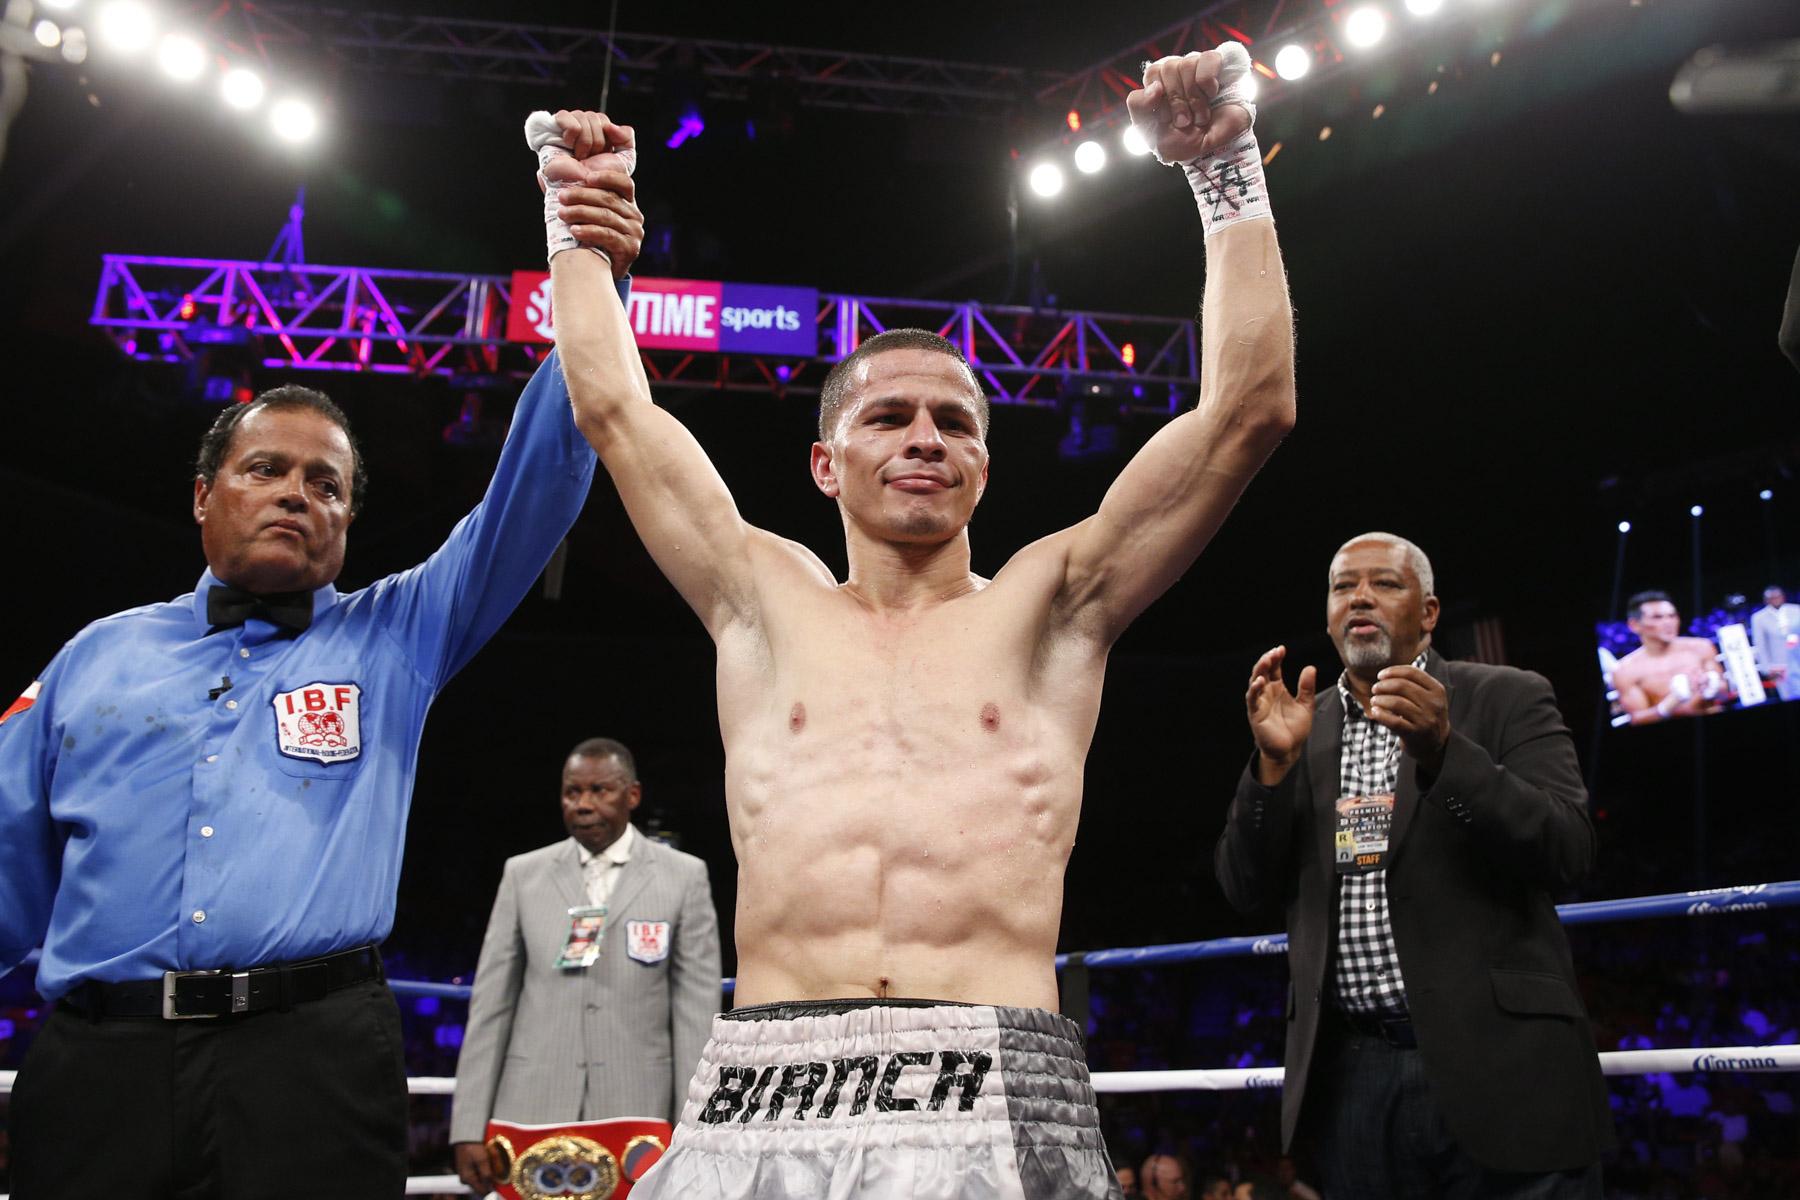 Boxing: McJoe Arroyo looking to make his ring return on June 1 - Arroyo